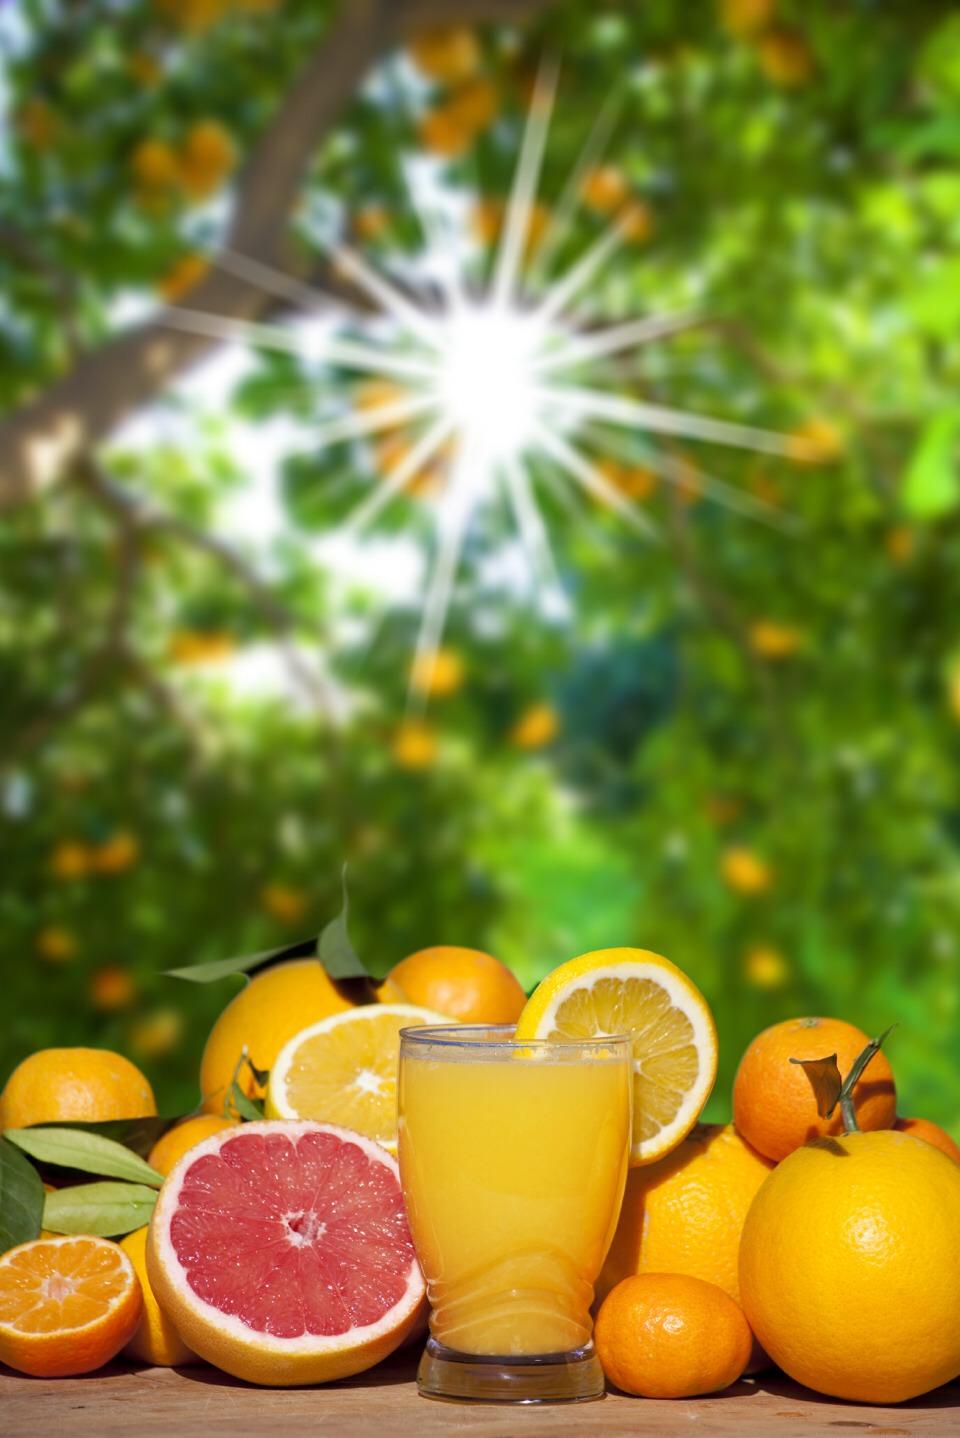 Increase your vitamin c.